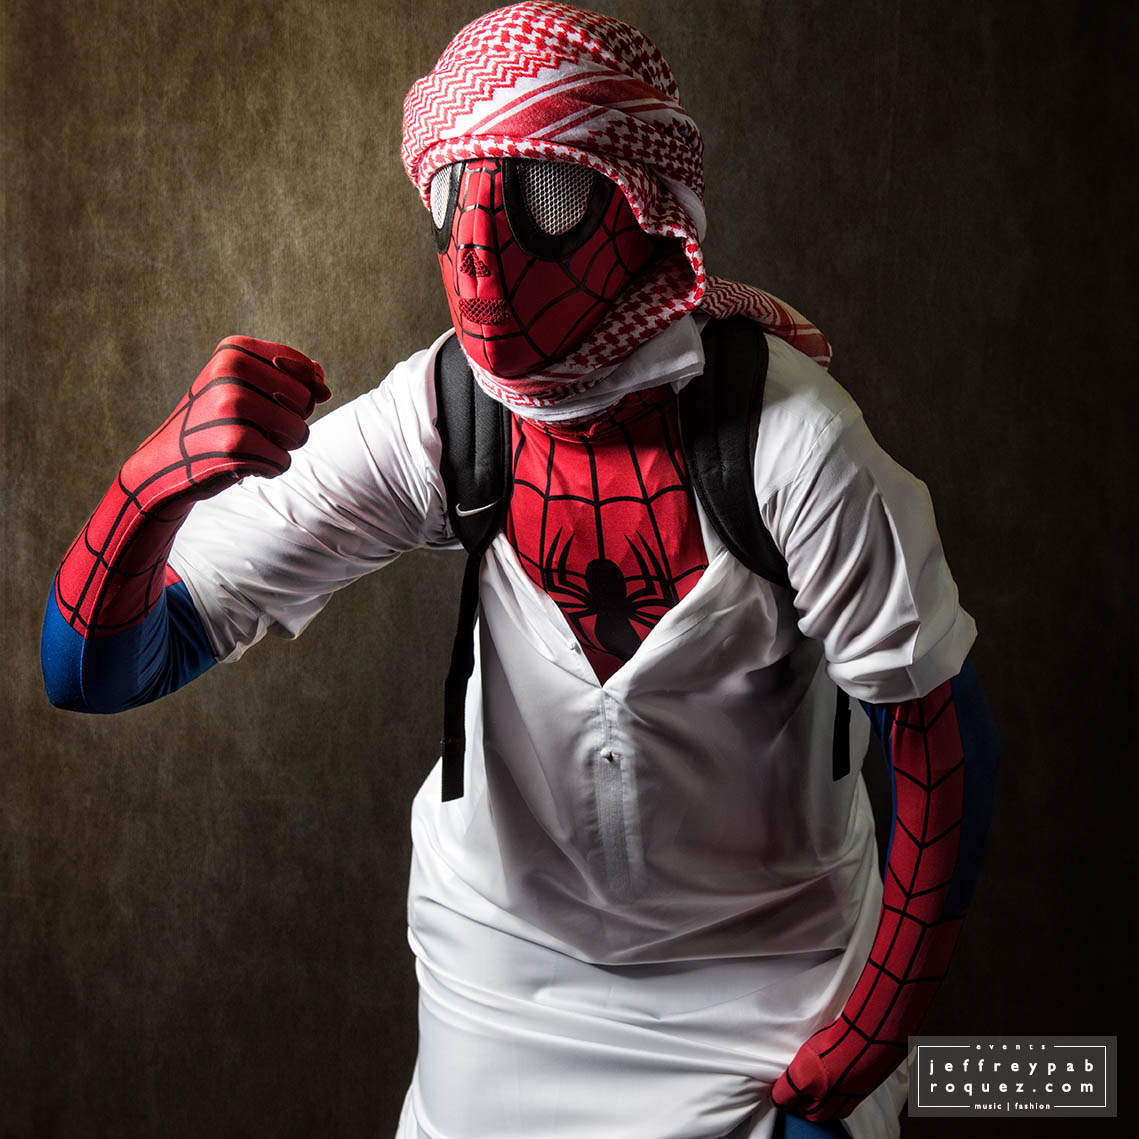 The Arabic Spiderman